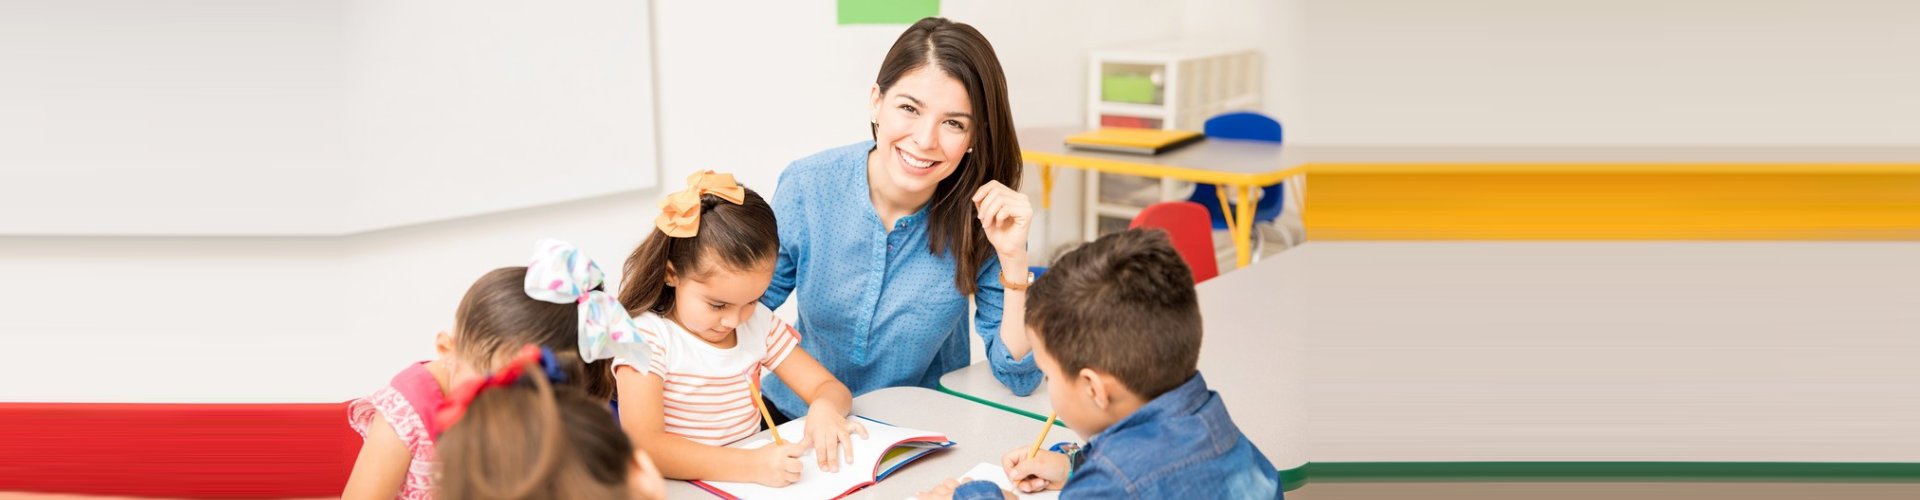 teacher helping the pre-school student